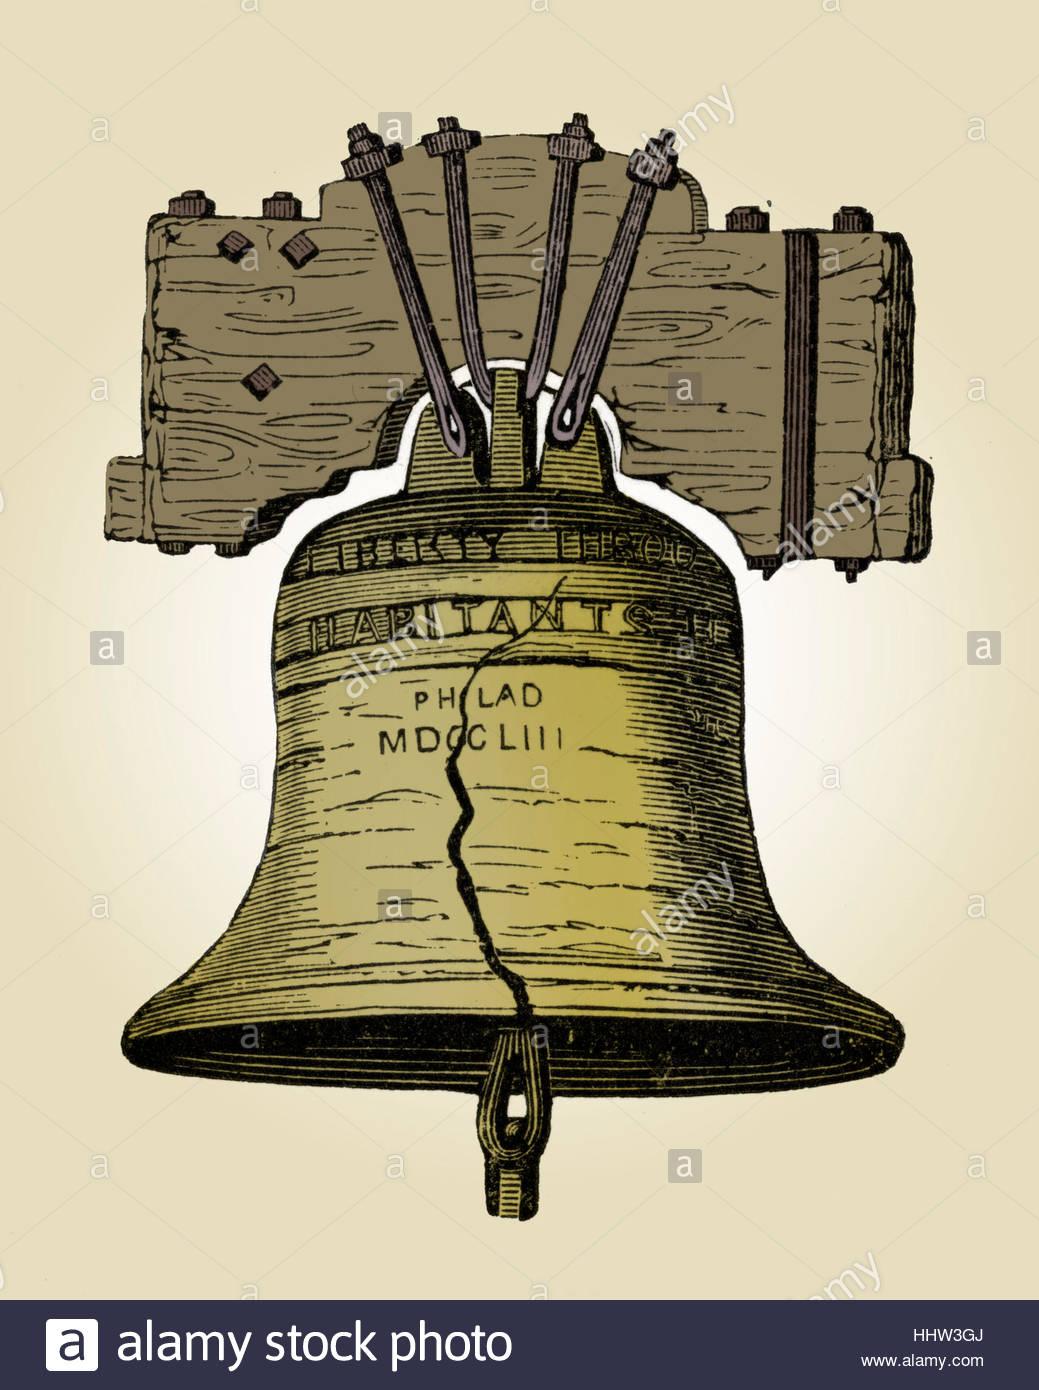 1039x1390 Liberty Bell, Philadelphia, Pennsylvania. One Of The Most